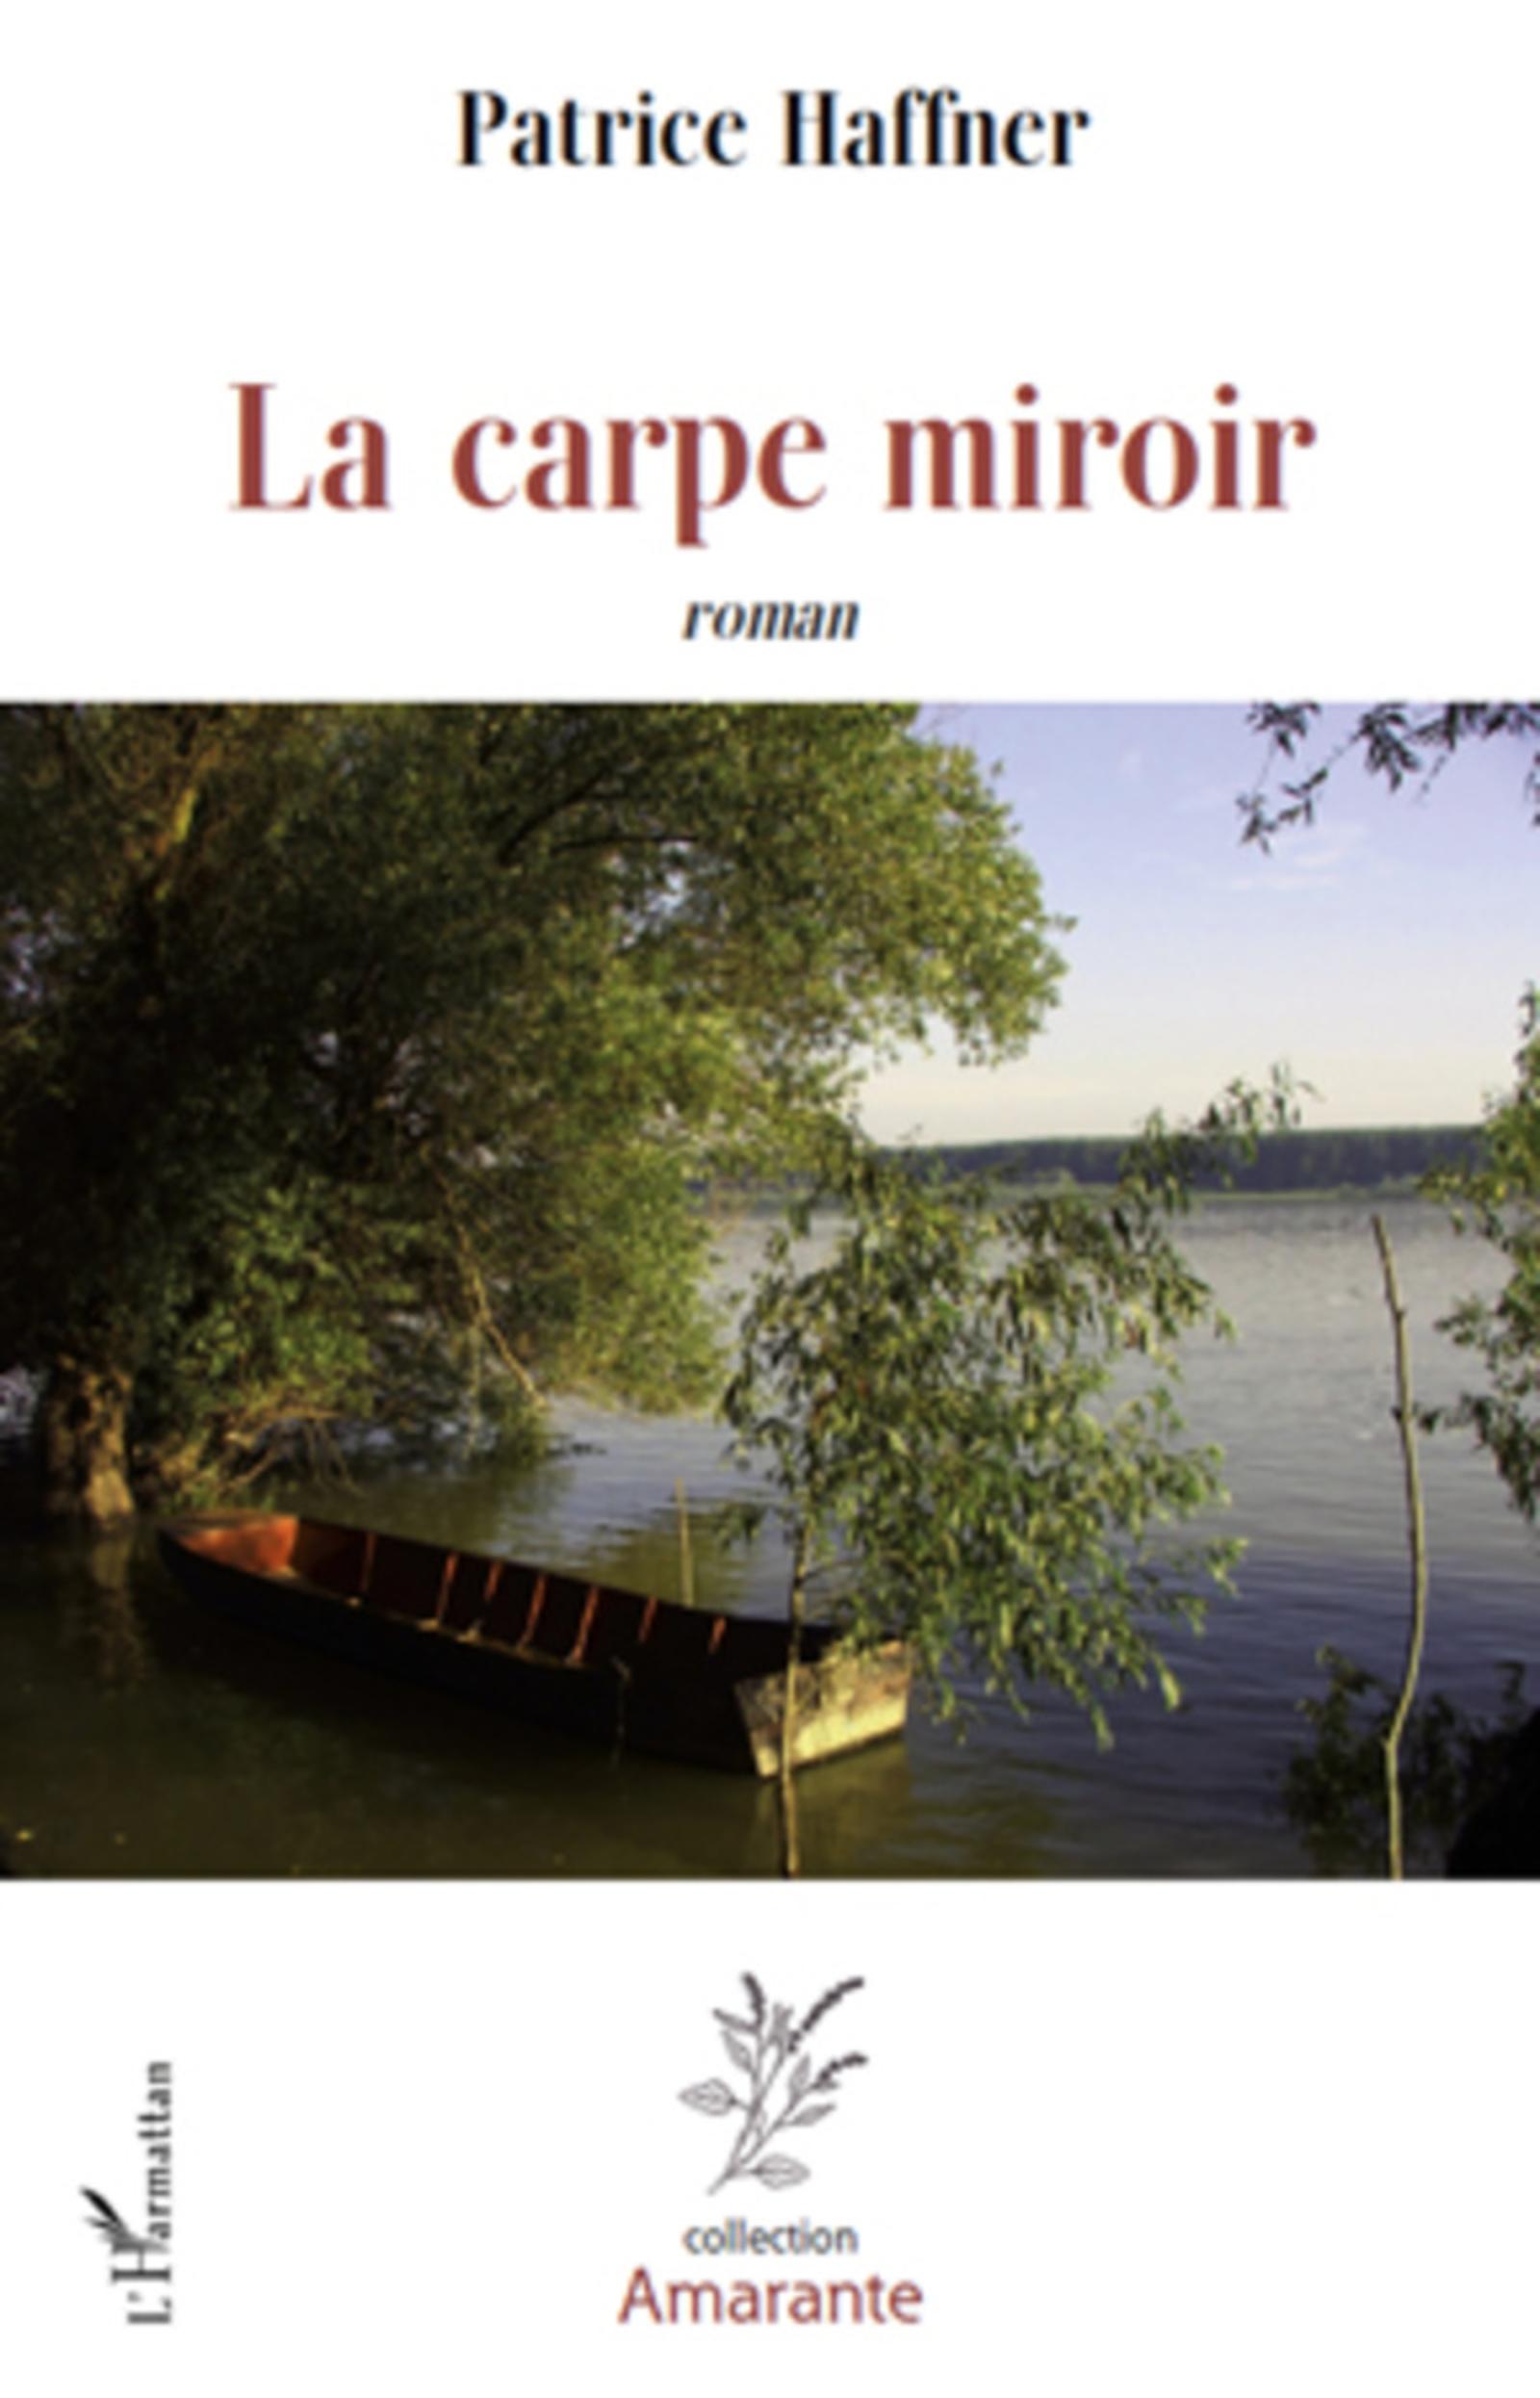 La carpe miroir